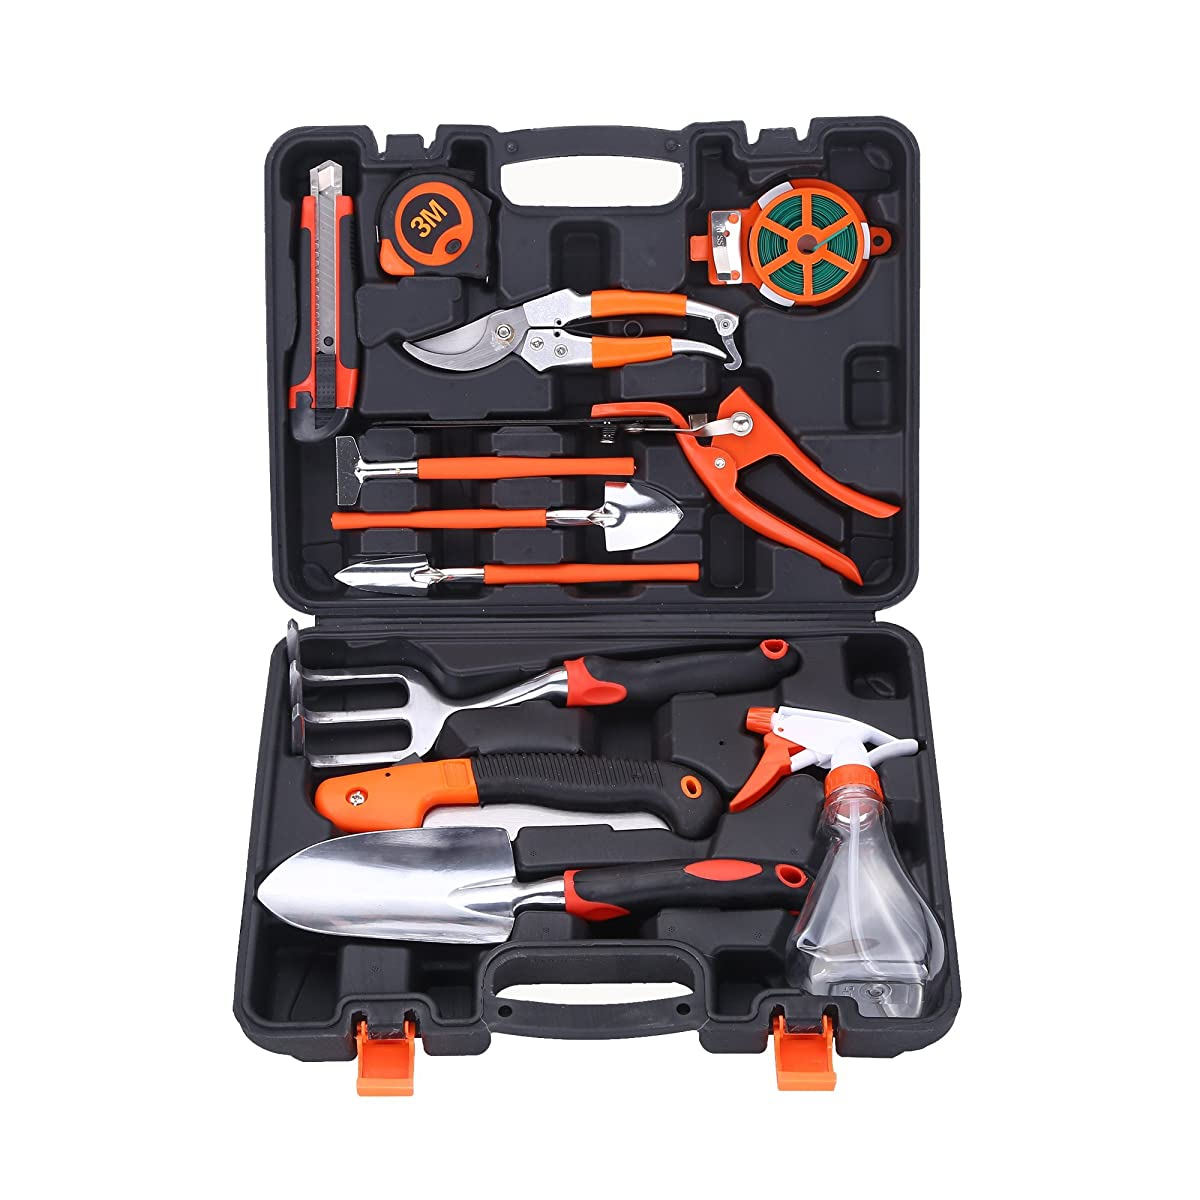 Colmax 13pcs Mixed General Garden Tool Kit Portable Diy